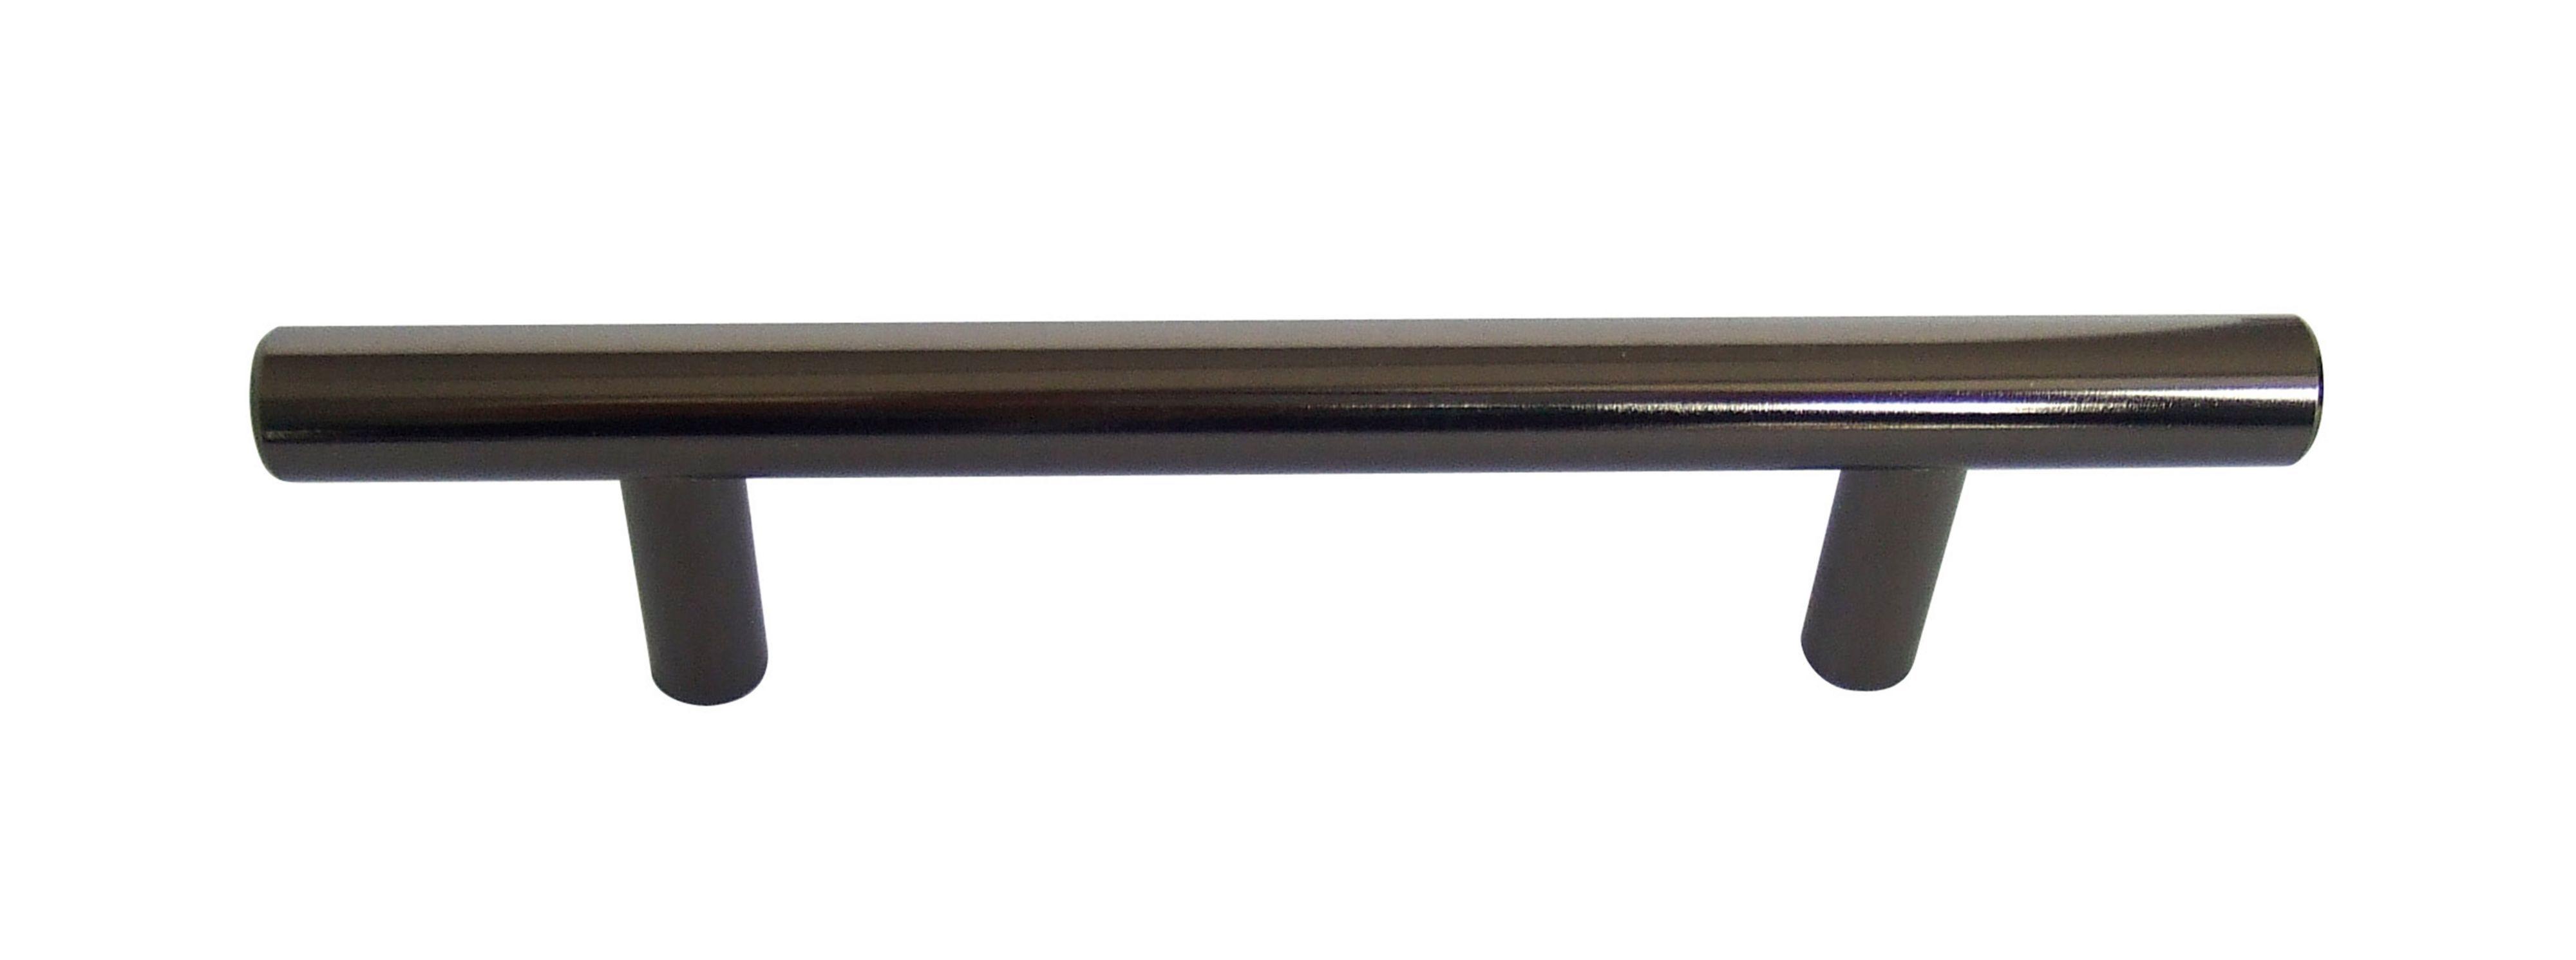 b q black nickel straight interior door pull cabinet. Black Bedroom Furniture Sets. Home Design Ideas